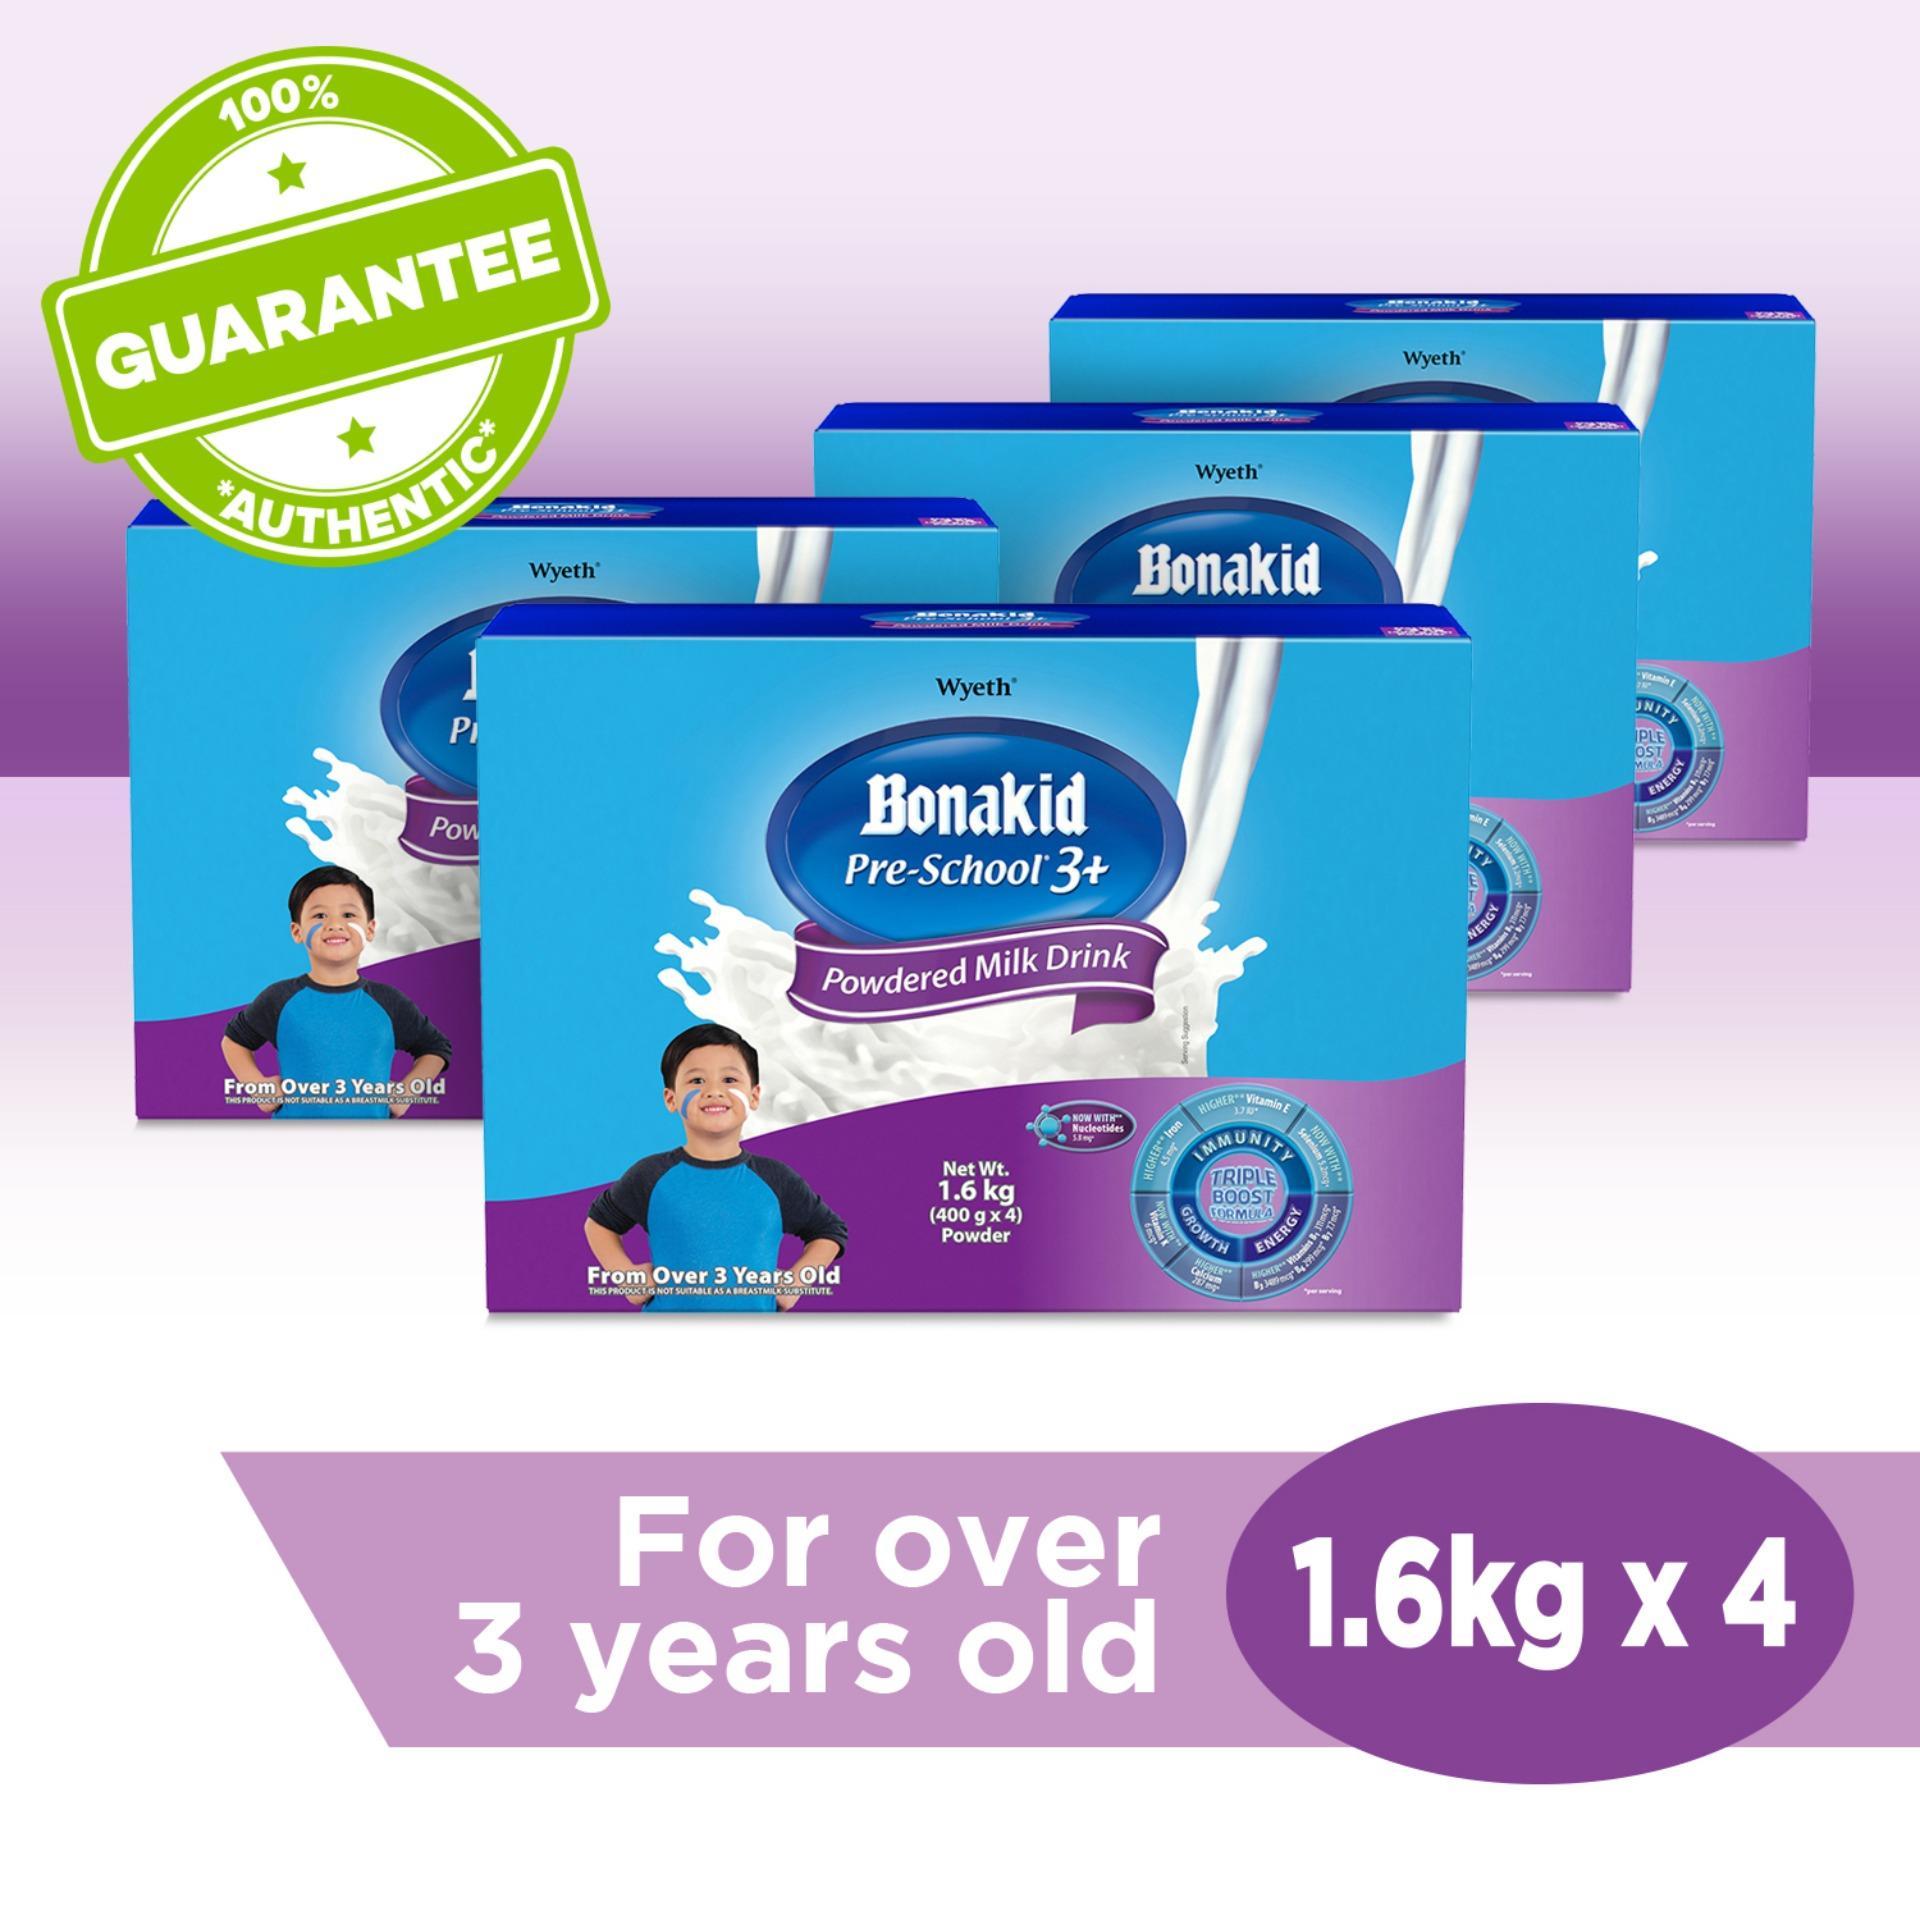 Baby Food Formula For Sale Breast Milk Online Brands Prices Enfagrow A Plus 3 1800 Gram Vanilla Box Wyeth Bonakid Pre School Stage 4 Powdered Drink Children